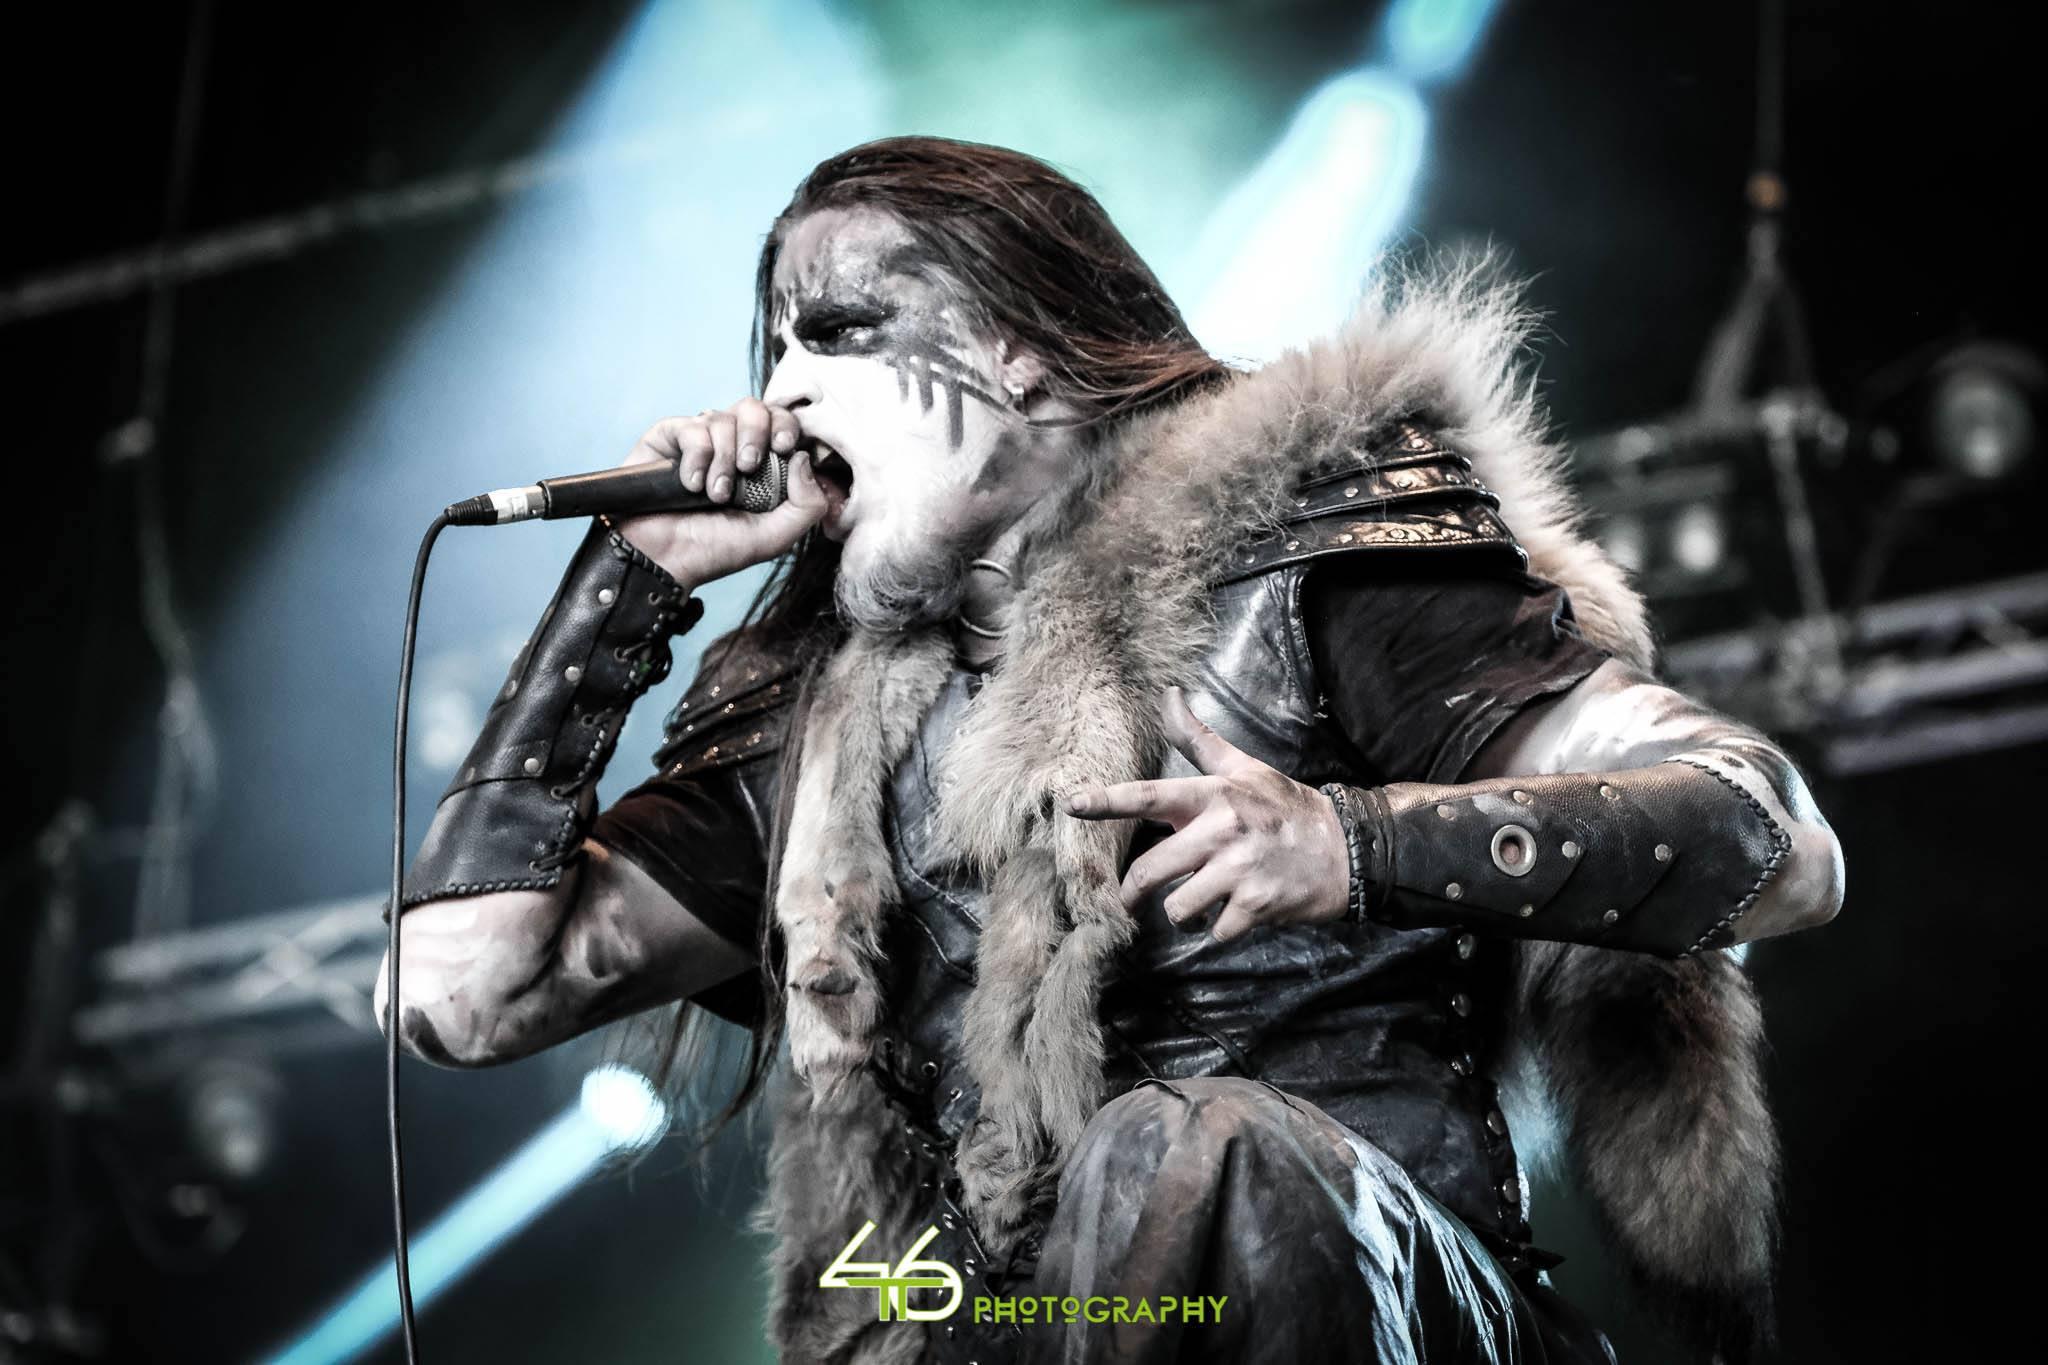 Rozhovor: Alexey z Welicoruss nejenom o Hellhammer Festivalu